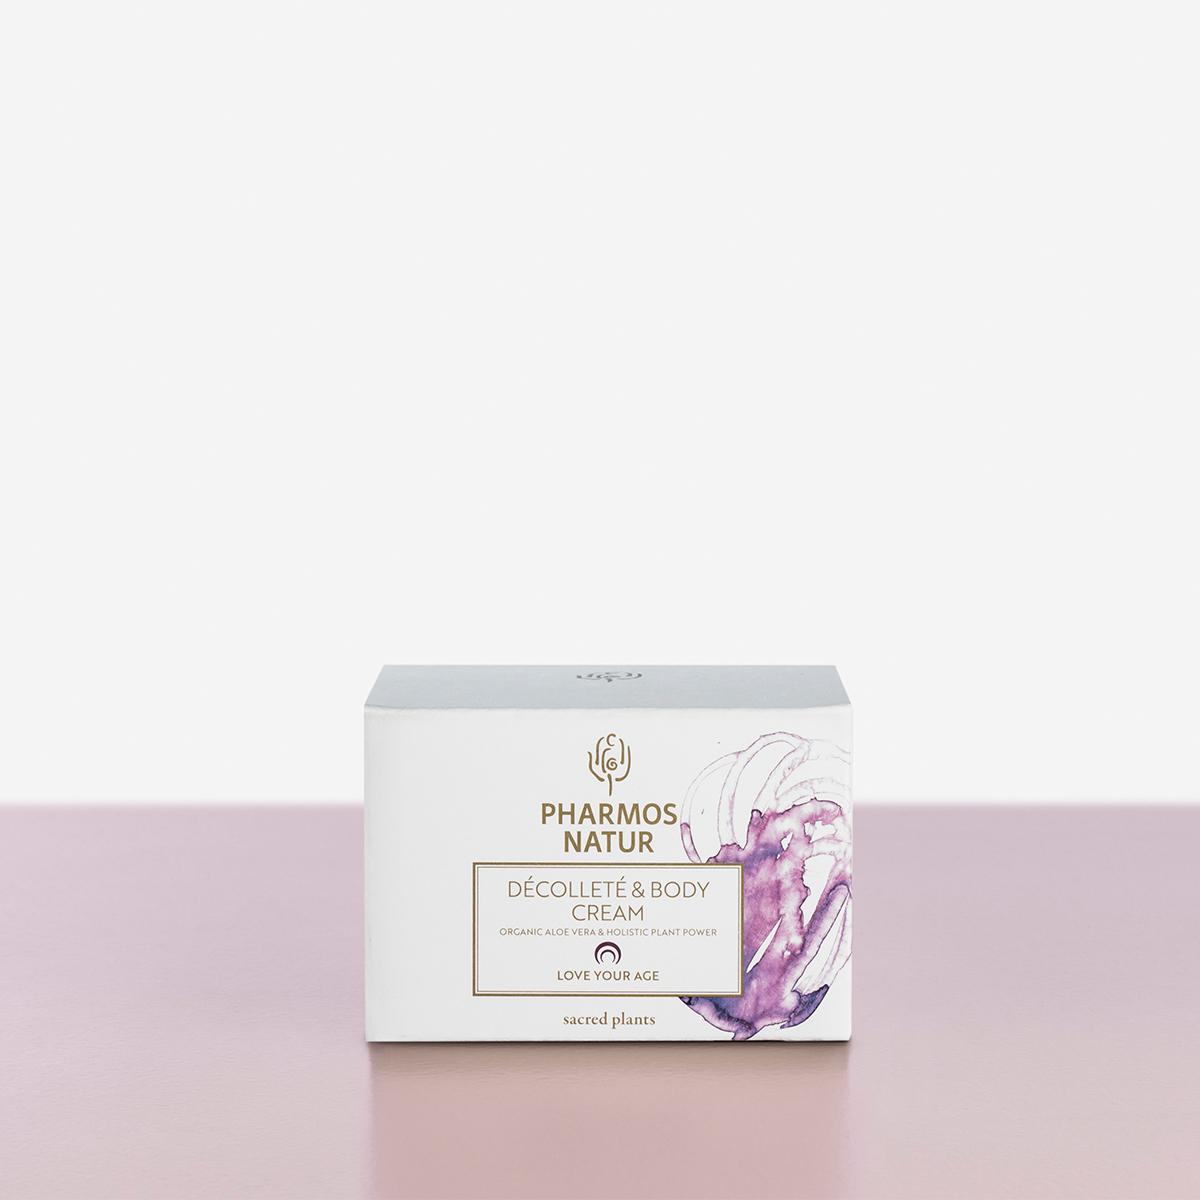 Verpackung Decollete and Body Cream Produktbild